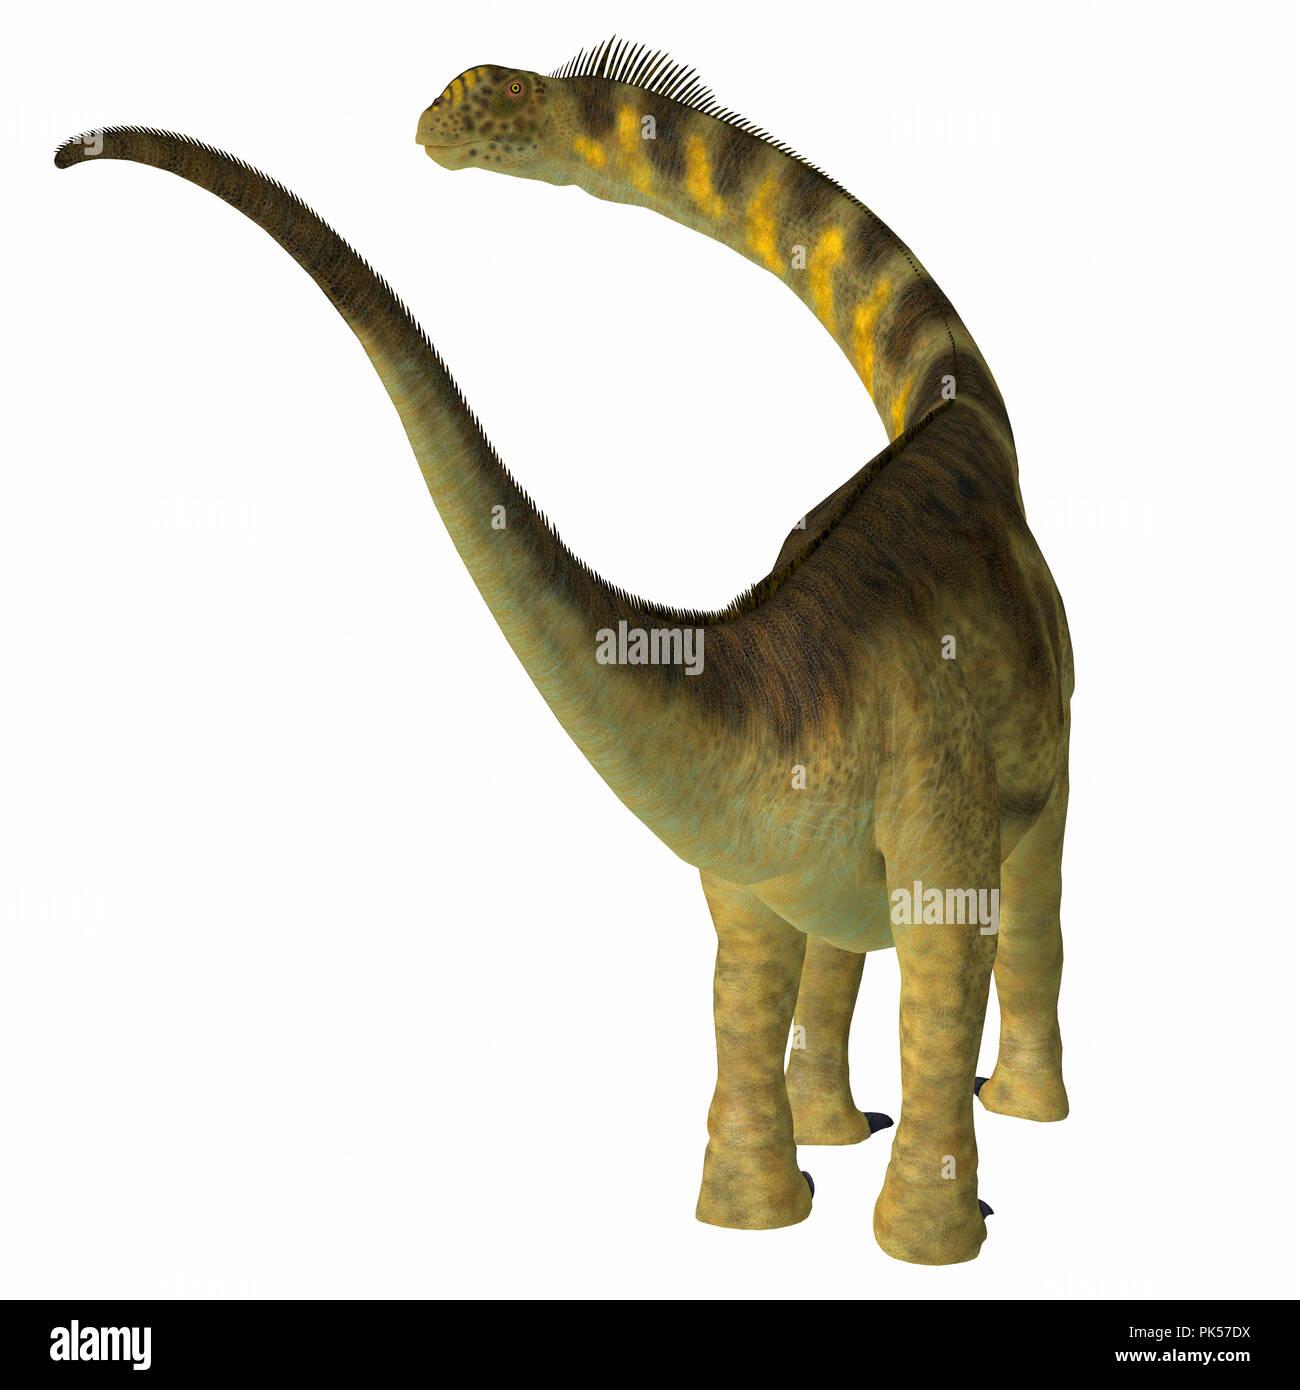 Camarasaurus Dinosaur Tail - Camarasaurus was a herbivorous sauropod dinosaur that lived in North America during the Jurassic Period. - Stock Image